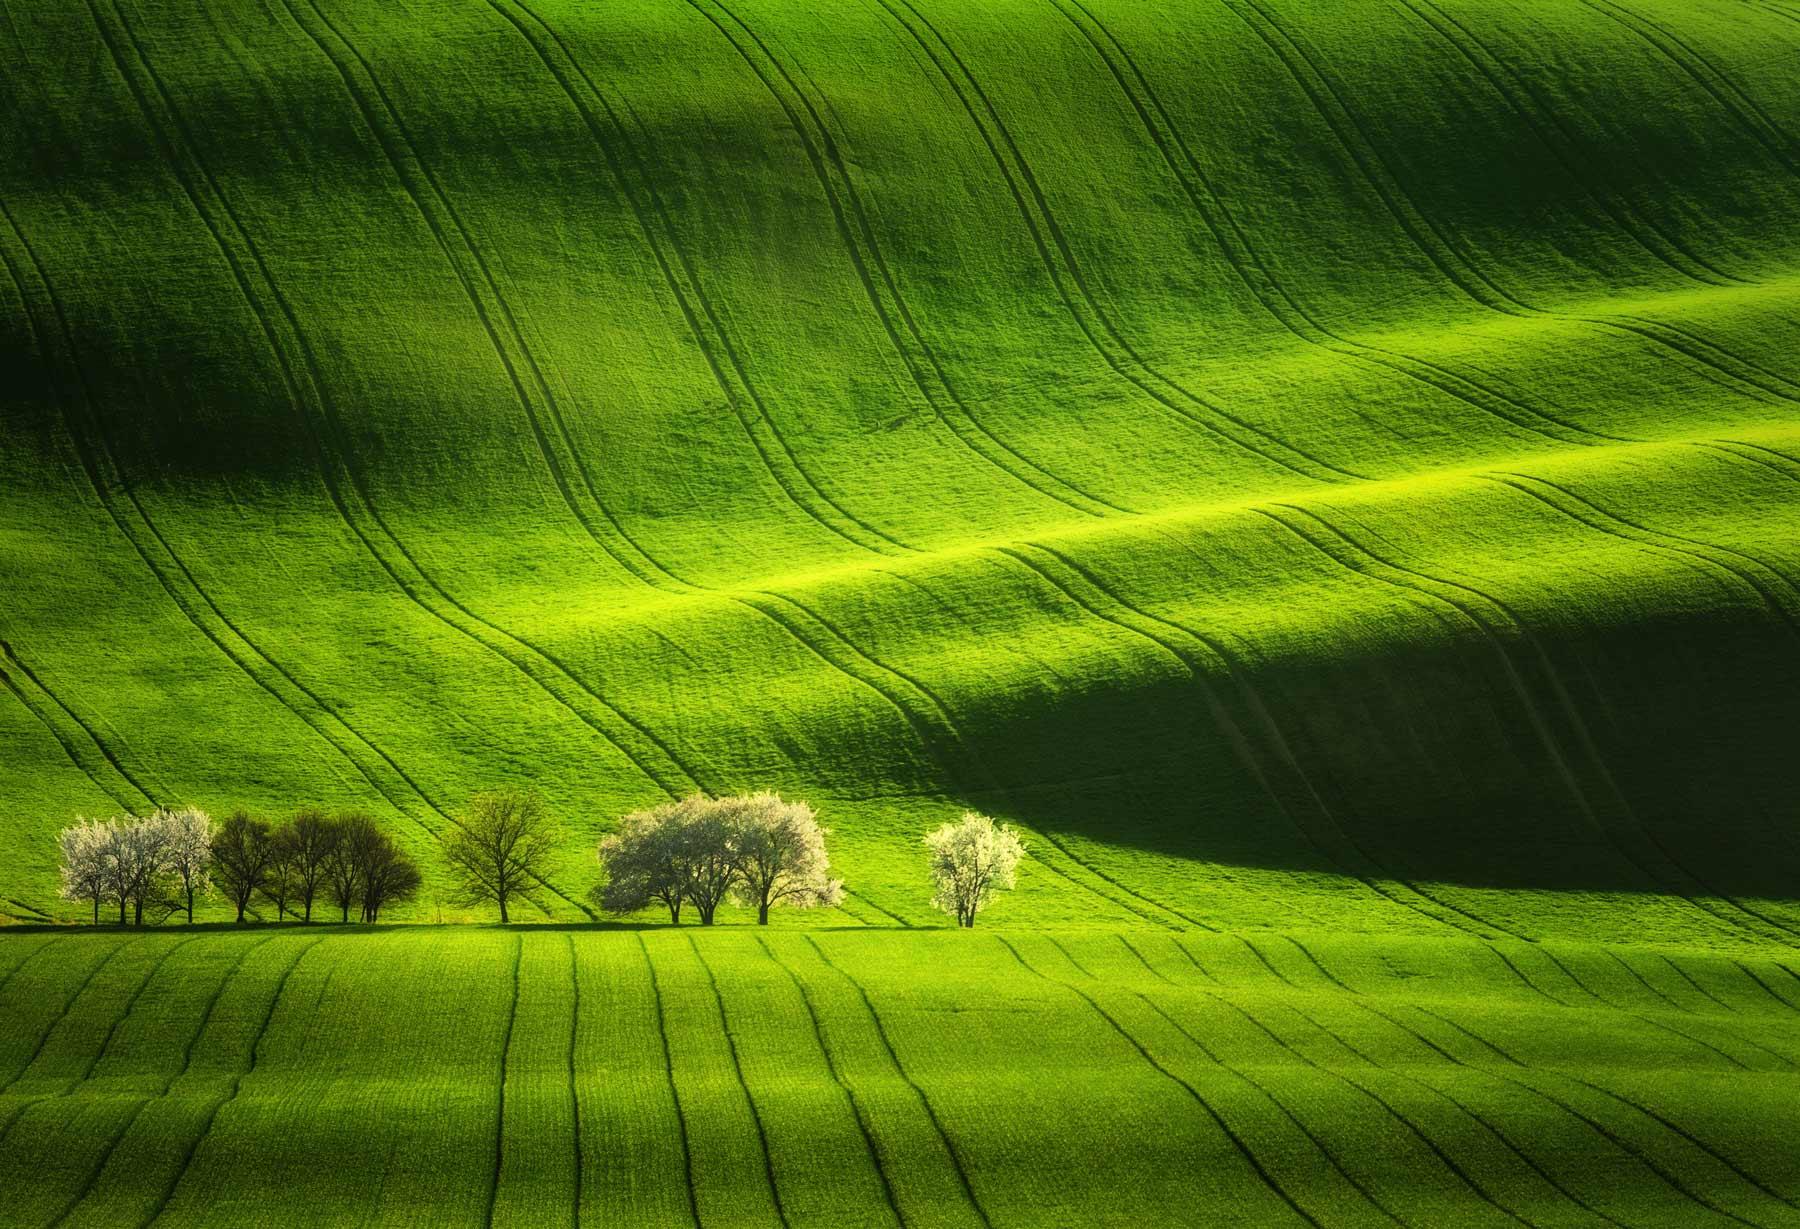 moravian tuscany Martin Bisof photography